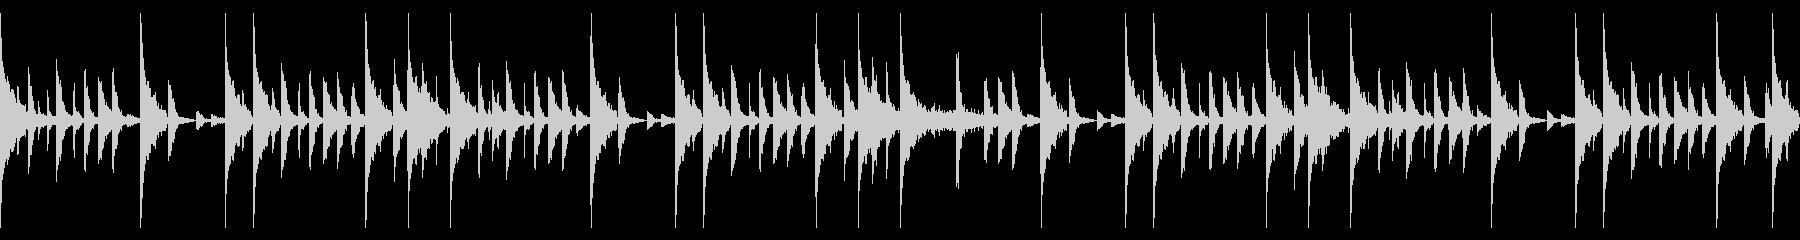 95 BPMの未再生の波形